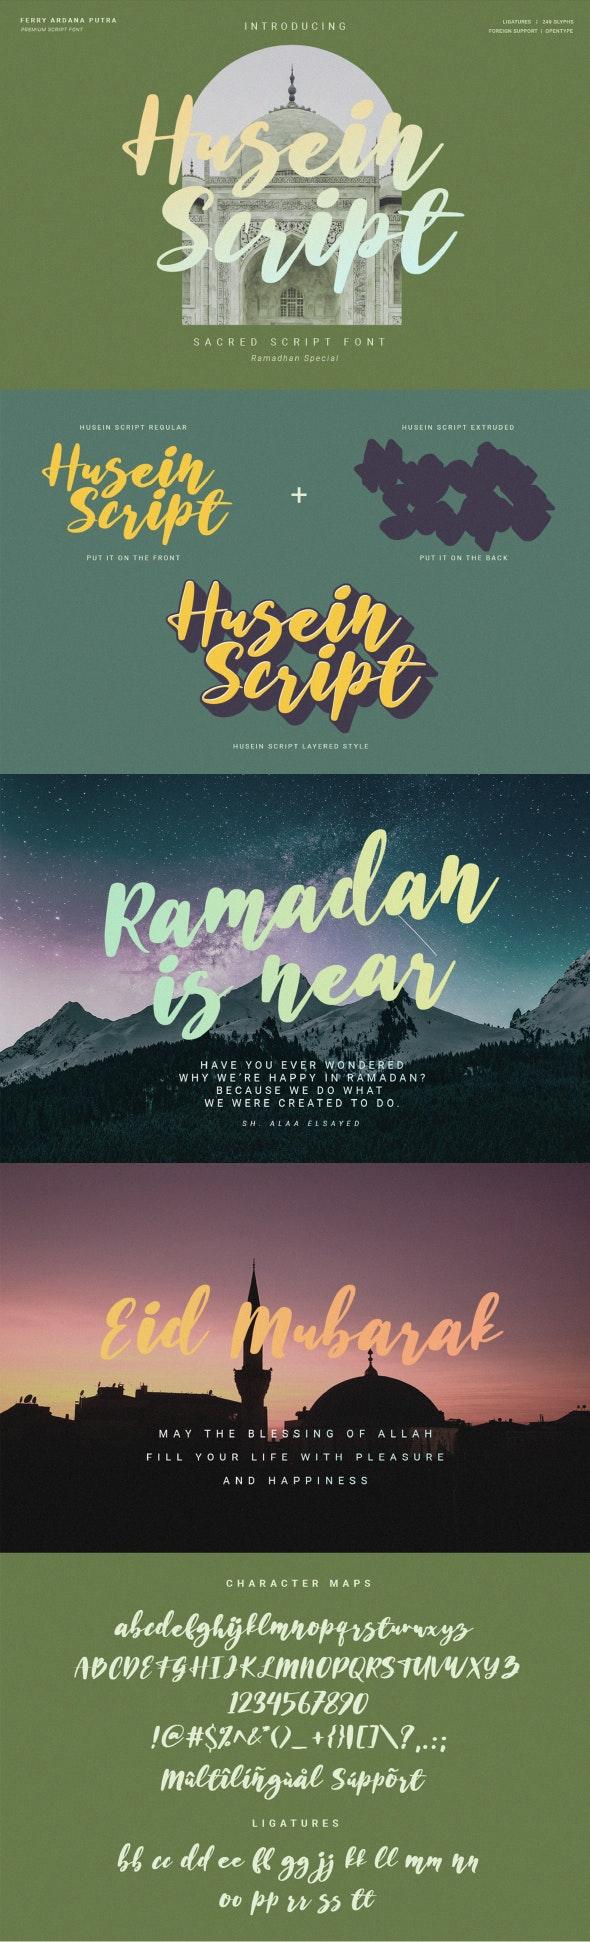 Husein Script | Handwritten Ramadan Font - Hand-writing Script